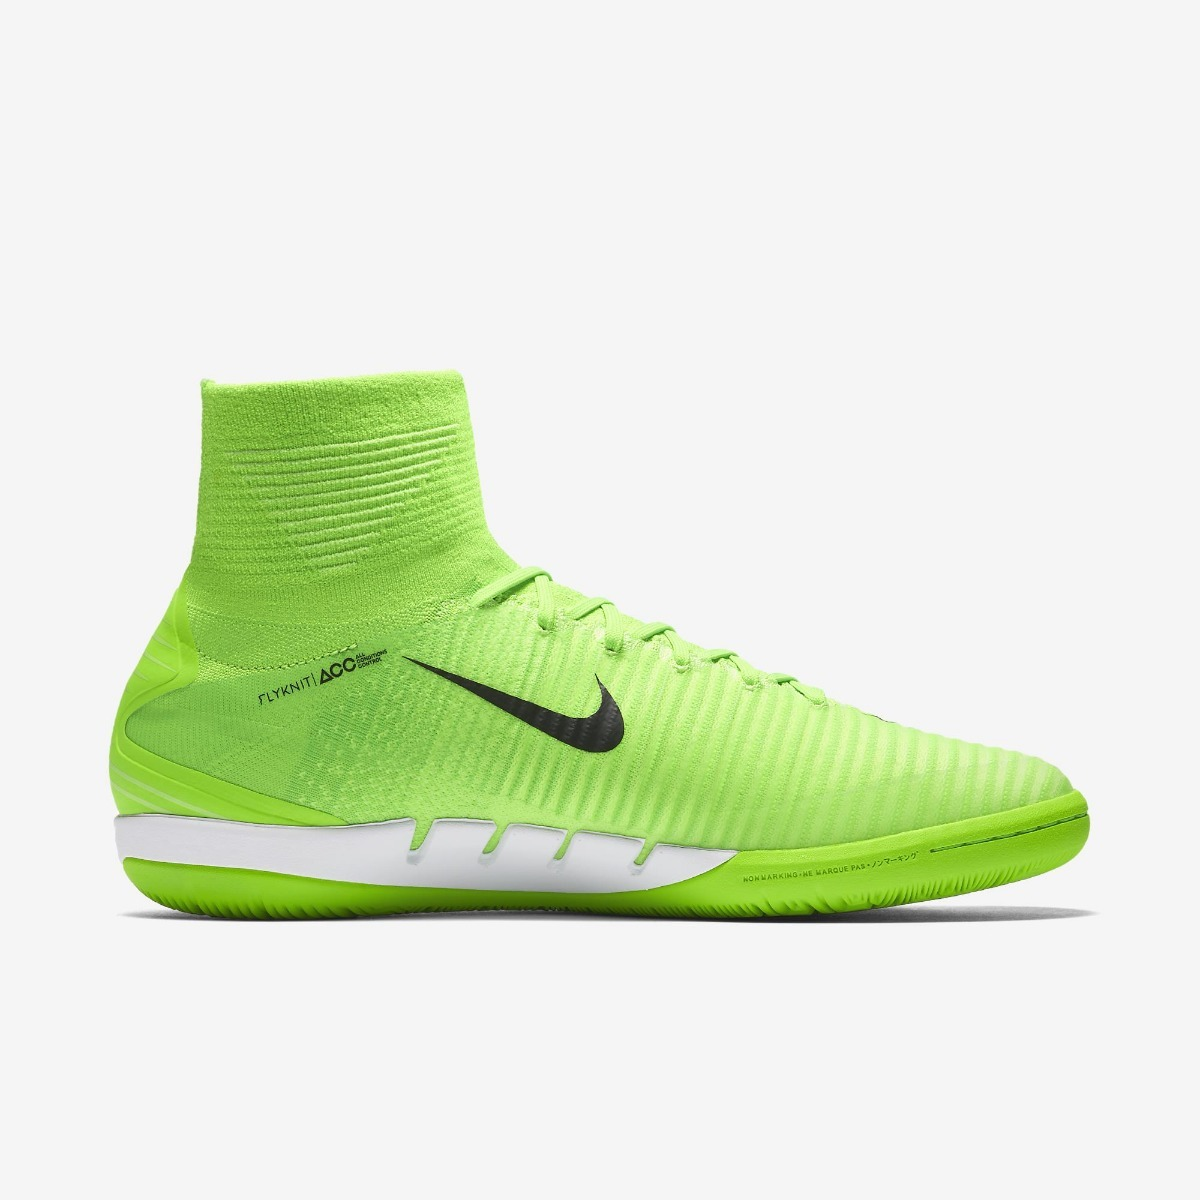 Chuteira Nike Mercurial X Proximo Ic (profissional Futsal) - R  479 ... ada947694d2f1